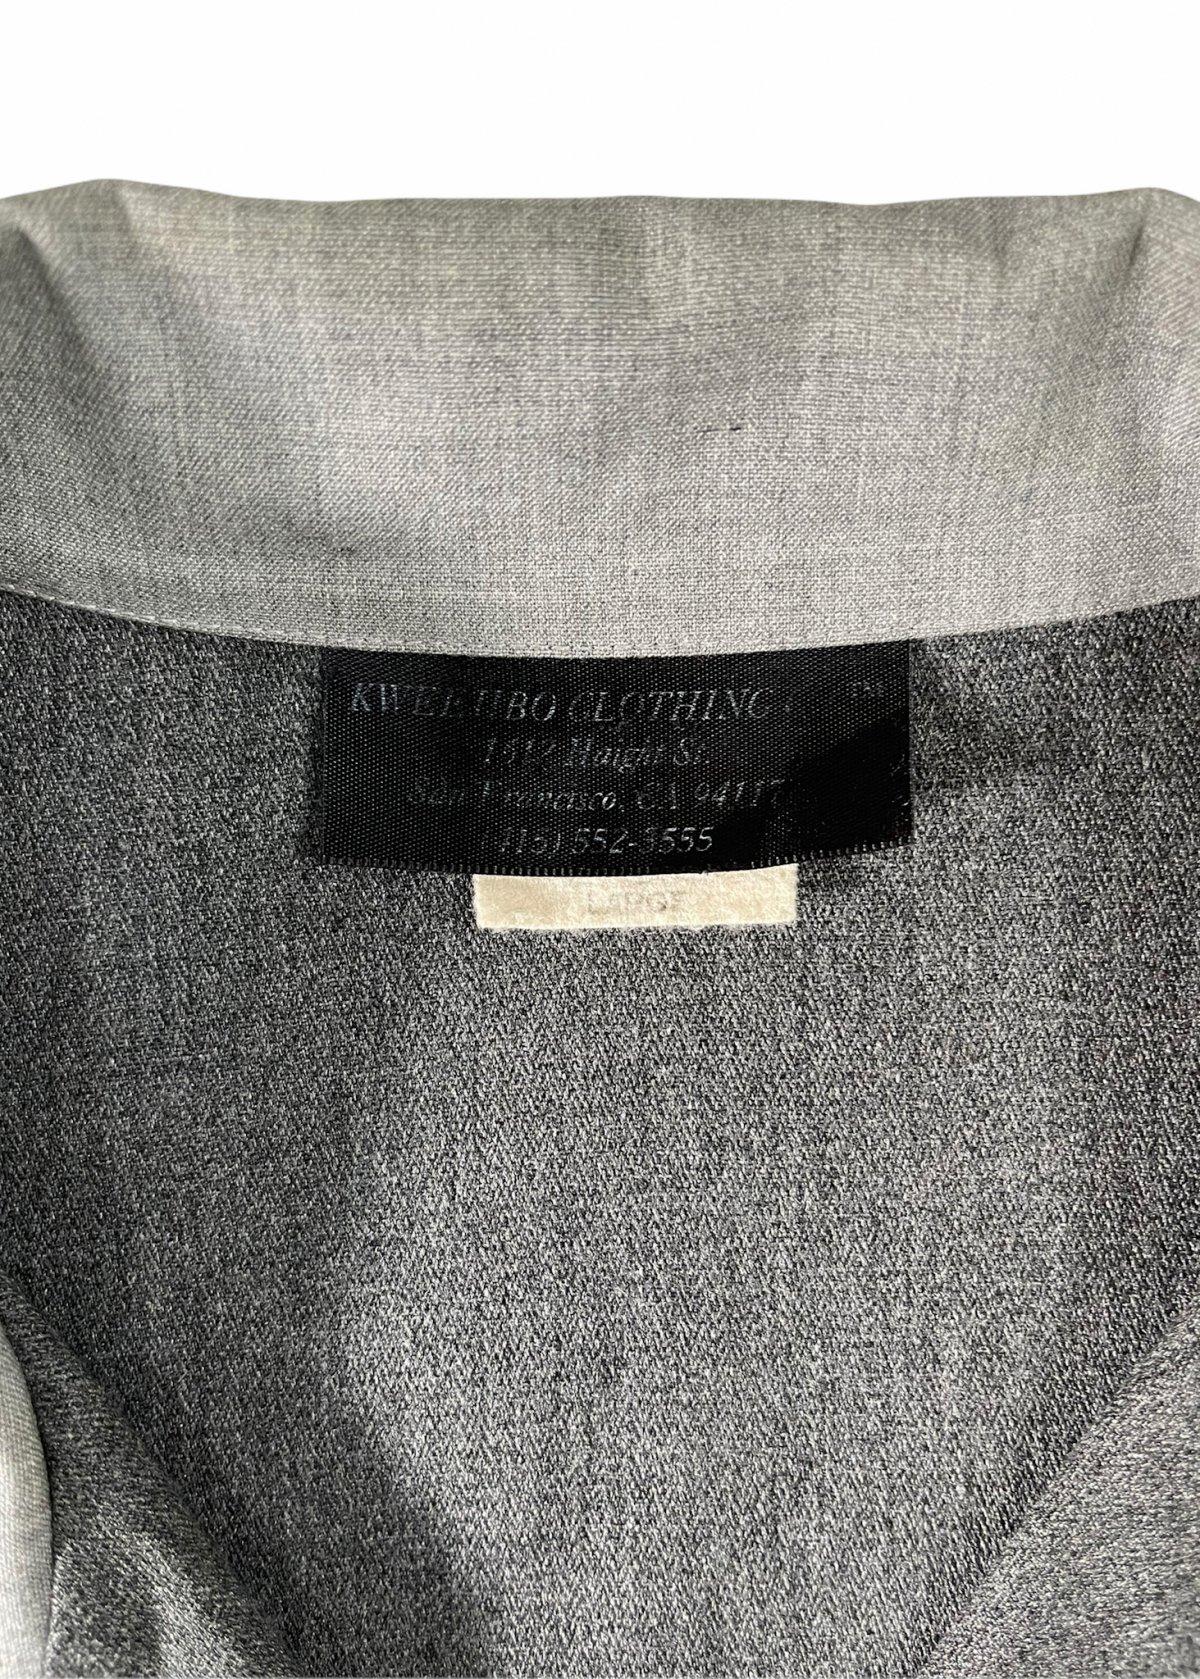 I&I 古着 通販 Vintage Wool Mix wide Shirt 詳細画像3